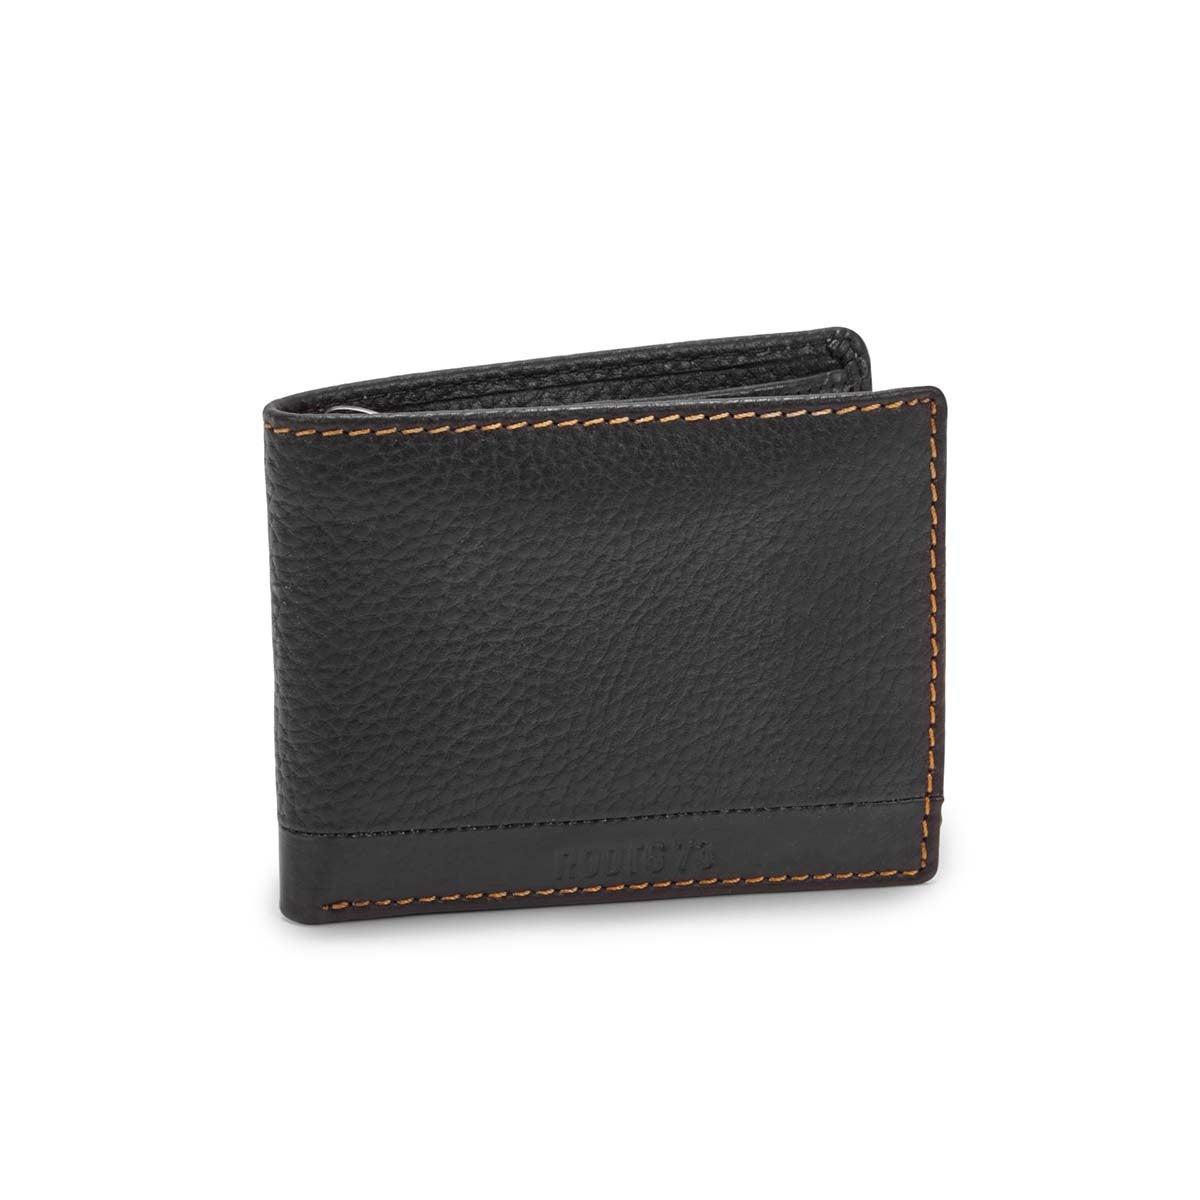 Men's AVERY black removable ID flap wallet